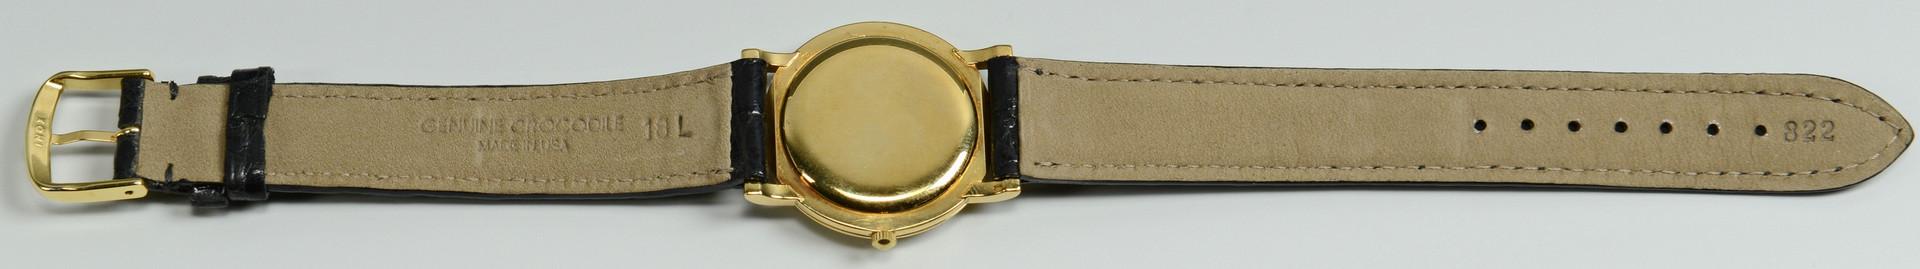 Lot 112: 1950s Men's Watch Vacheron Constantin Patrimony